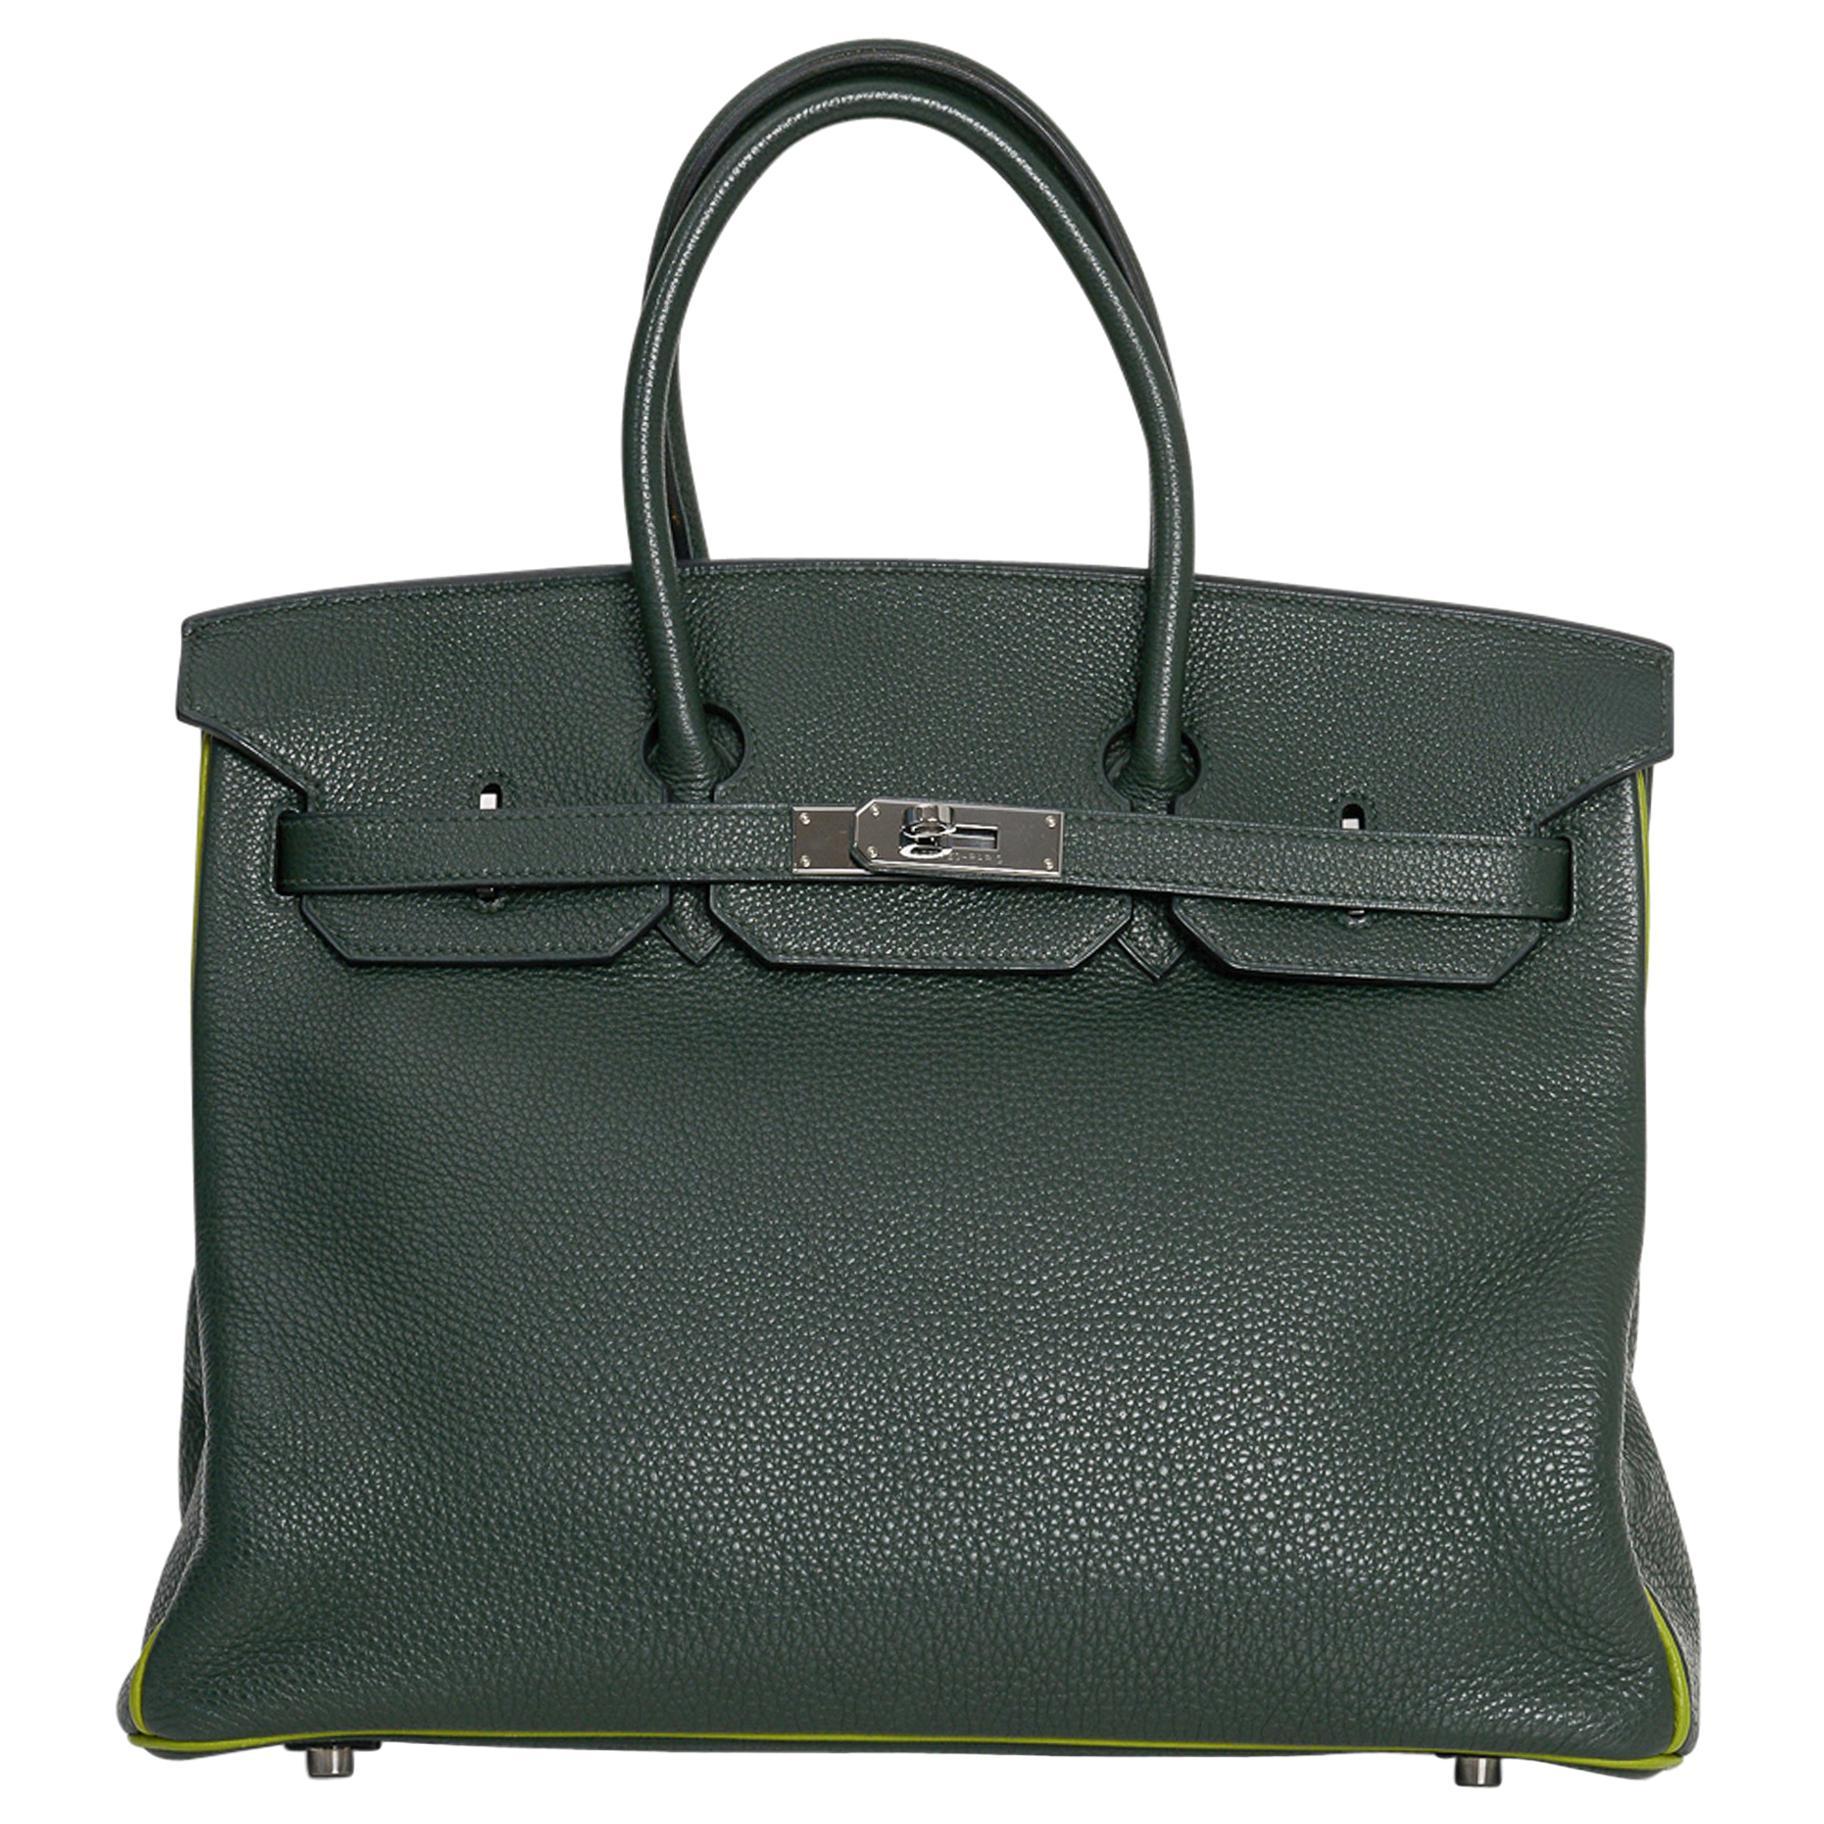 Hermes Birkin 35 Bag Vert Fonce / Vert Anis / Chartreuse Interior Ruthenium Togo